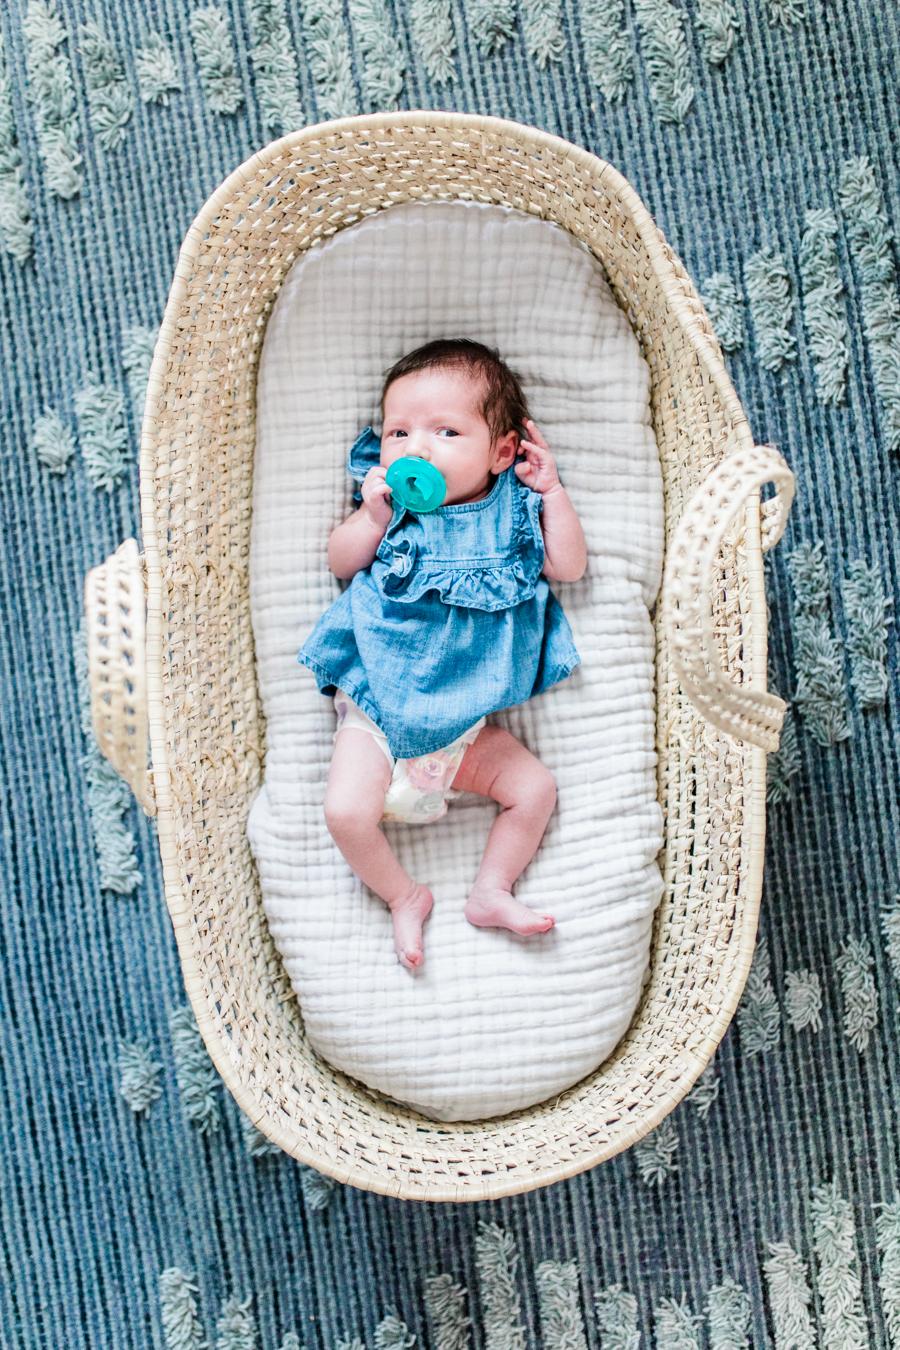 newborn_photographer_houston_texas23.jpg